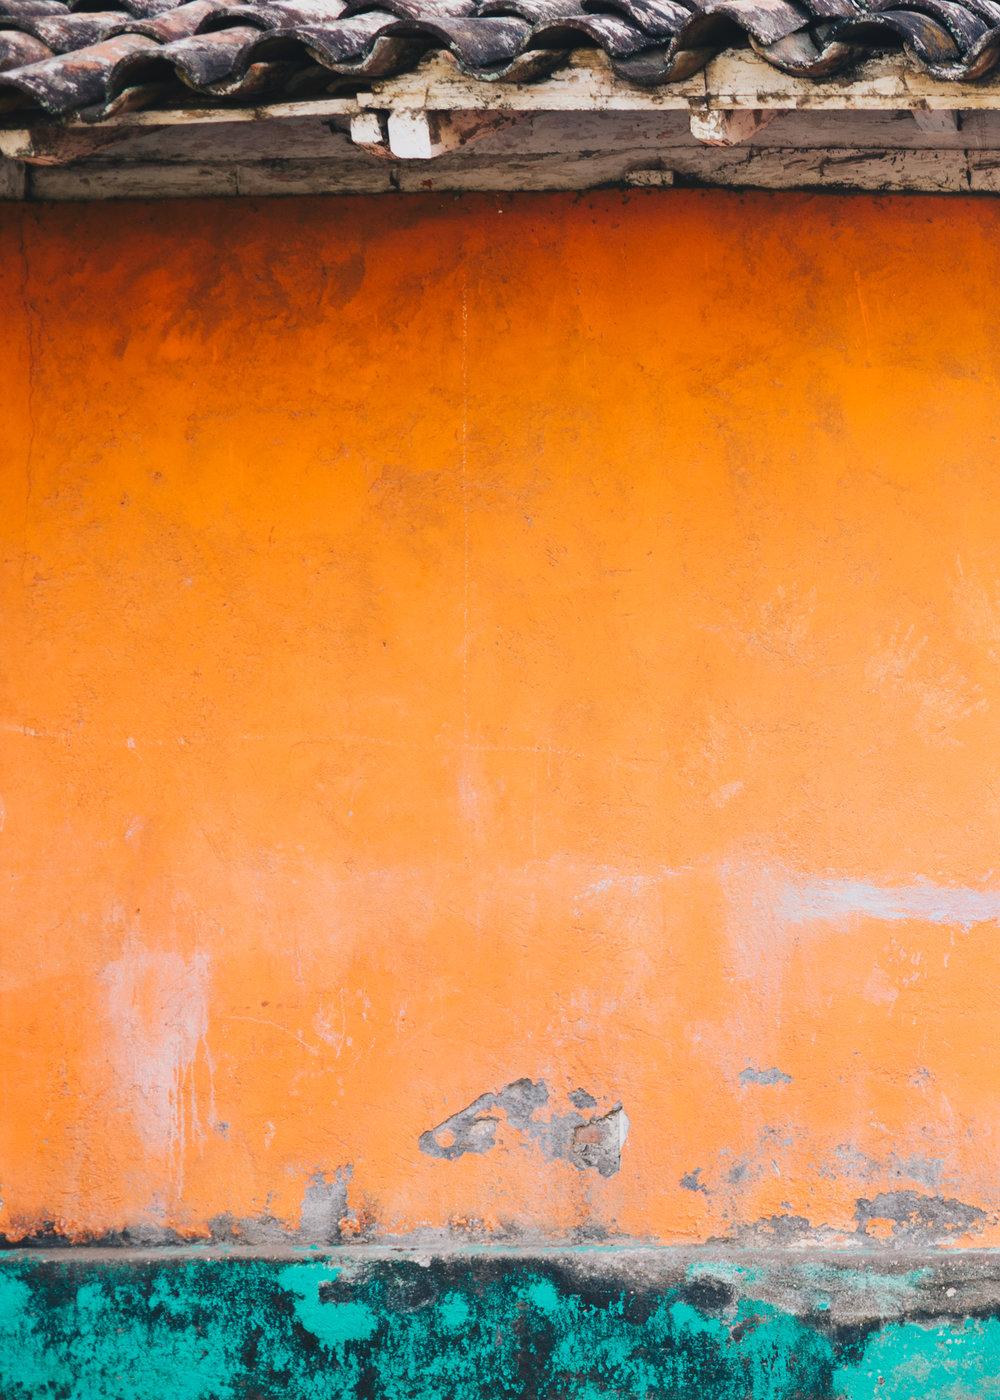 Ometepe_LeicaCL-42.jpg